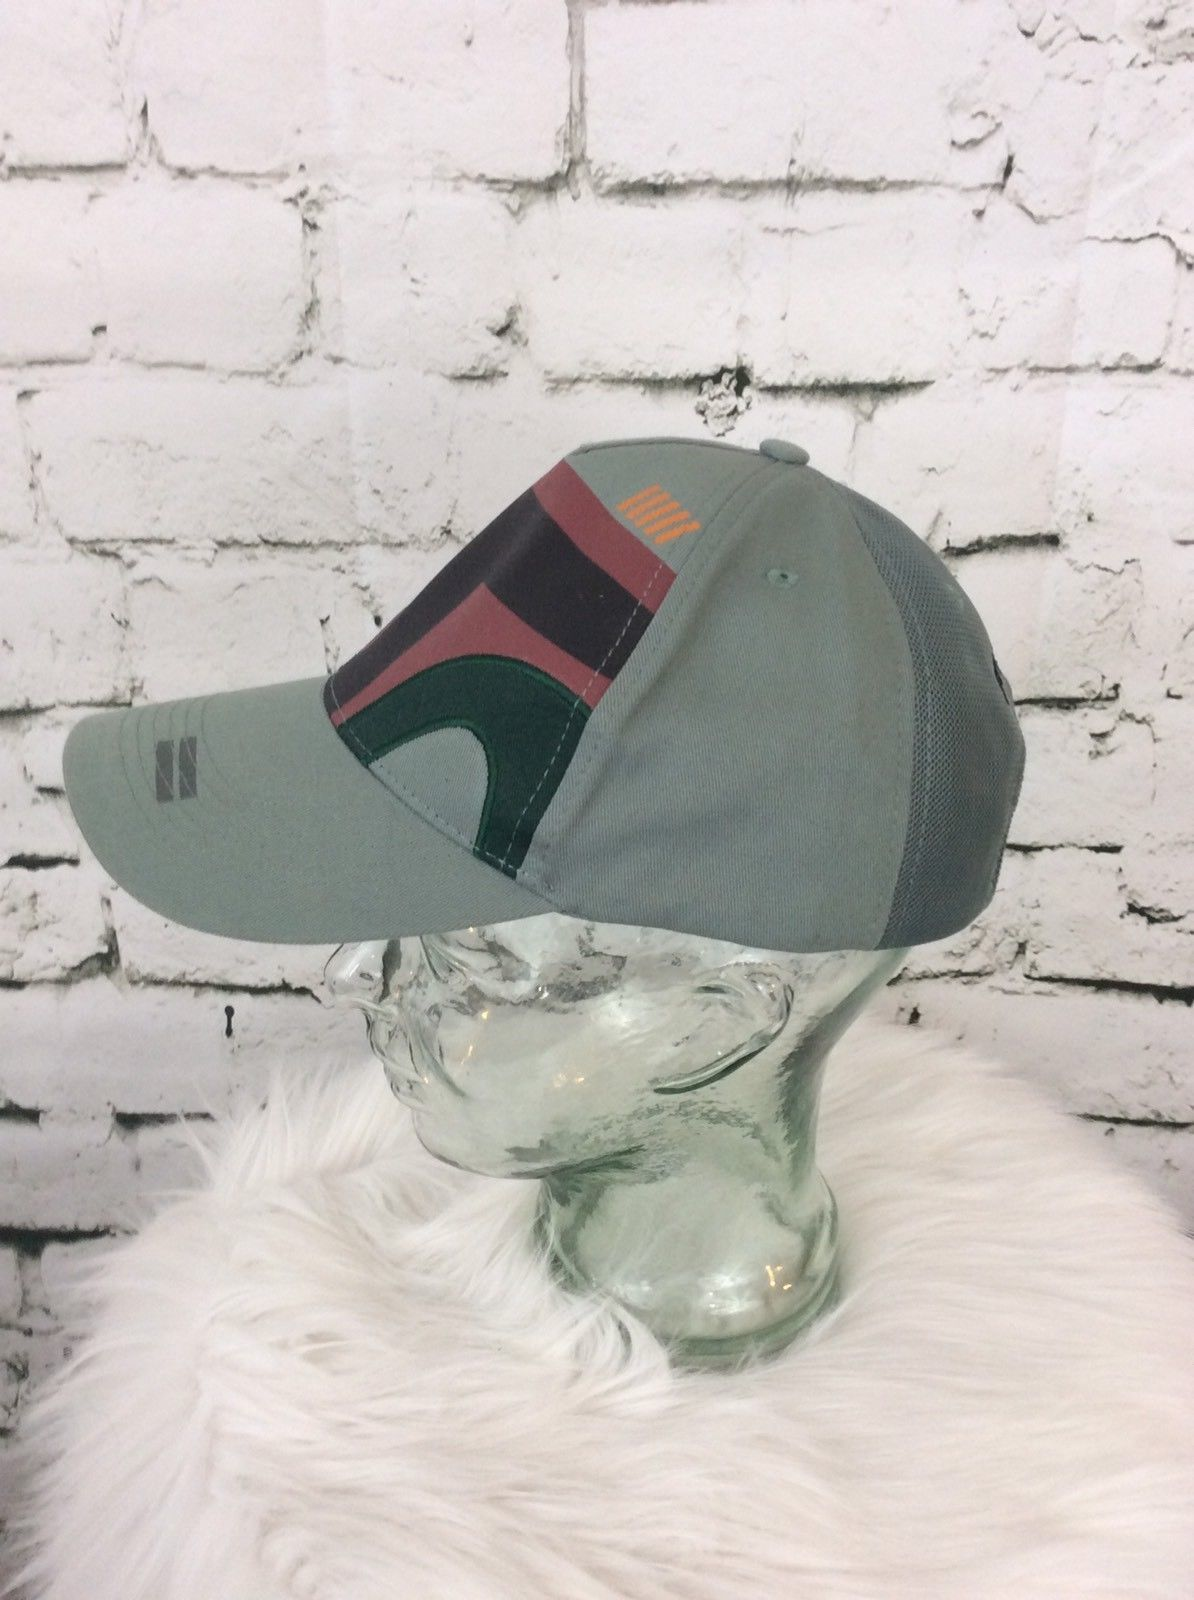 37a7bfe2c30 Disney Parks Star Wars Boba Fett Hat Cap and 50 similar items